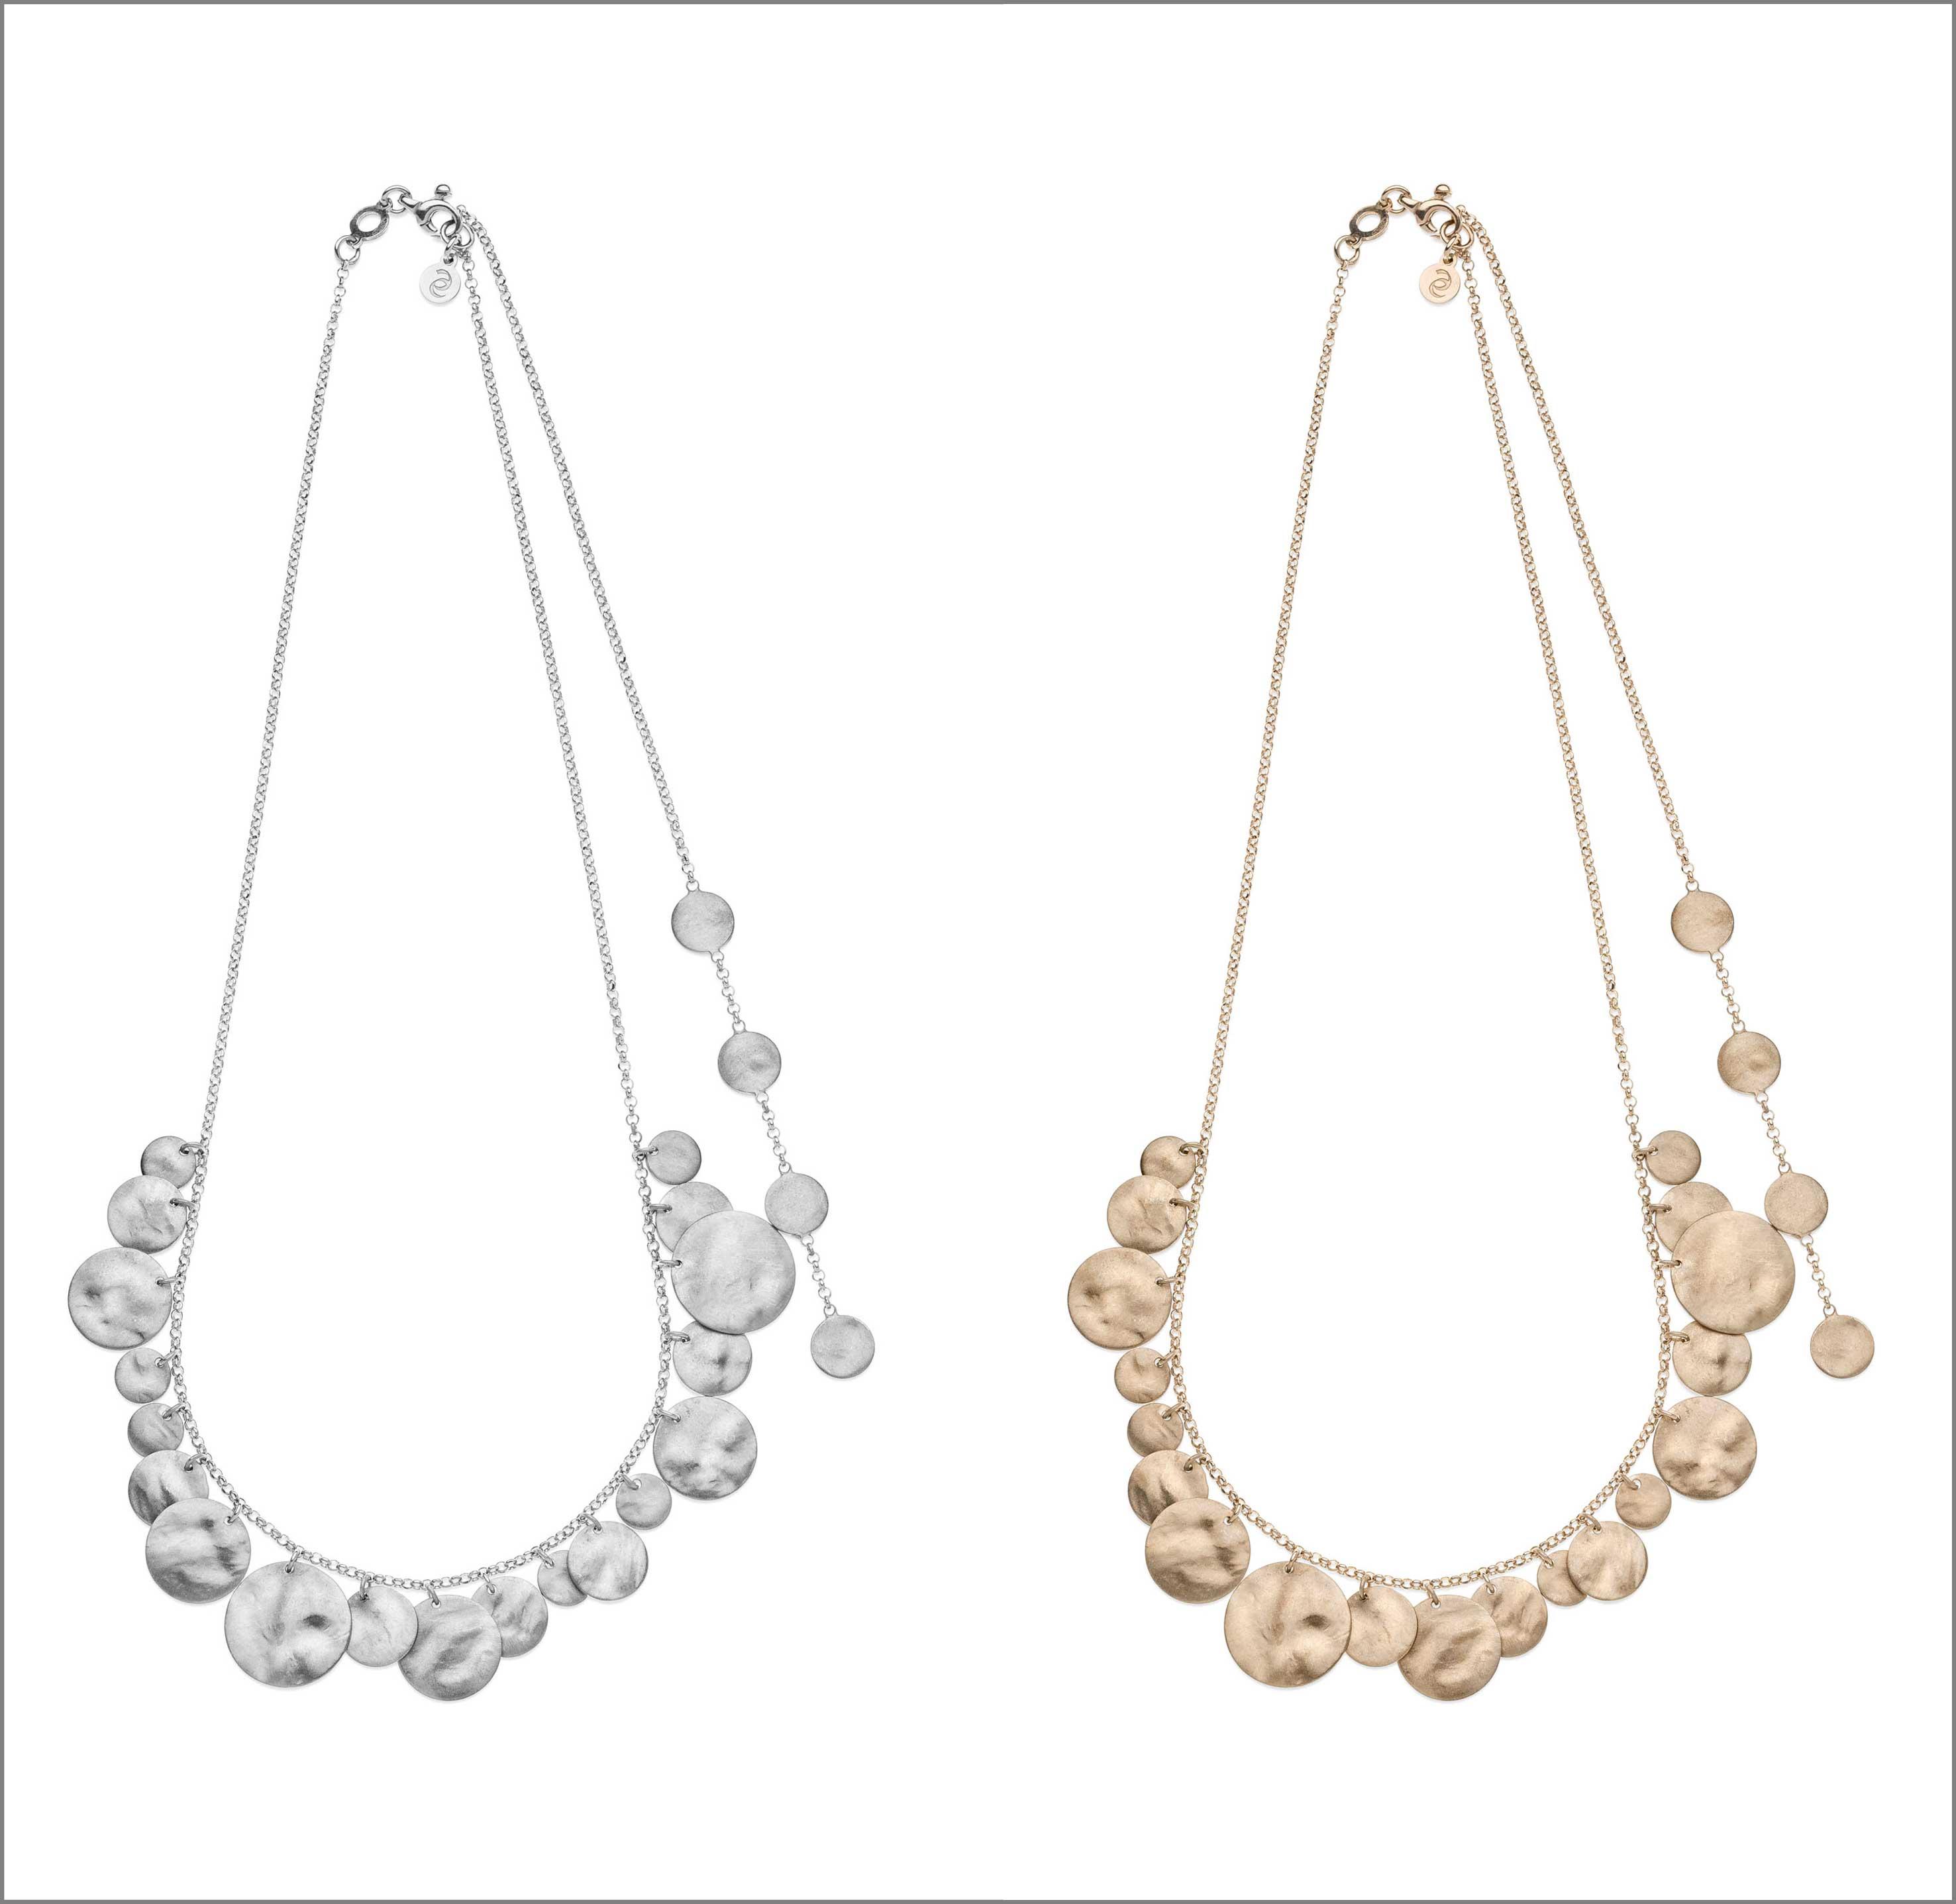 Collane in argento di Éclat